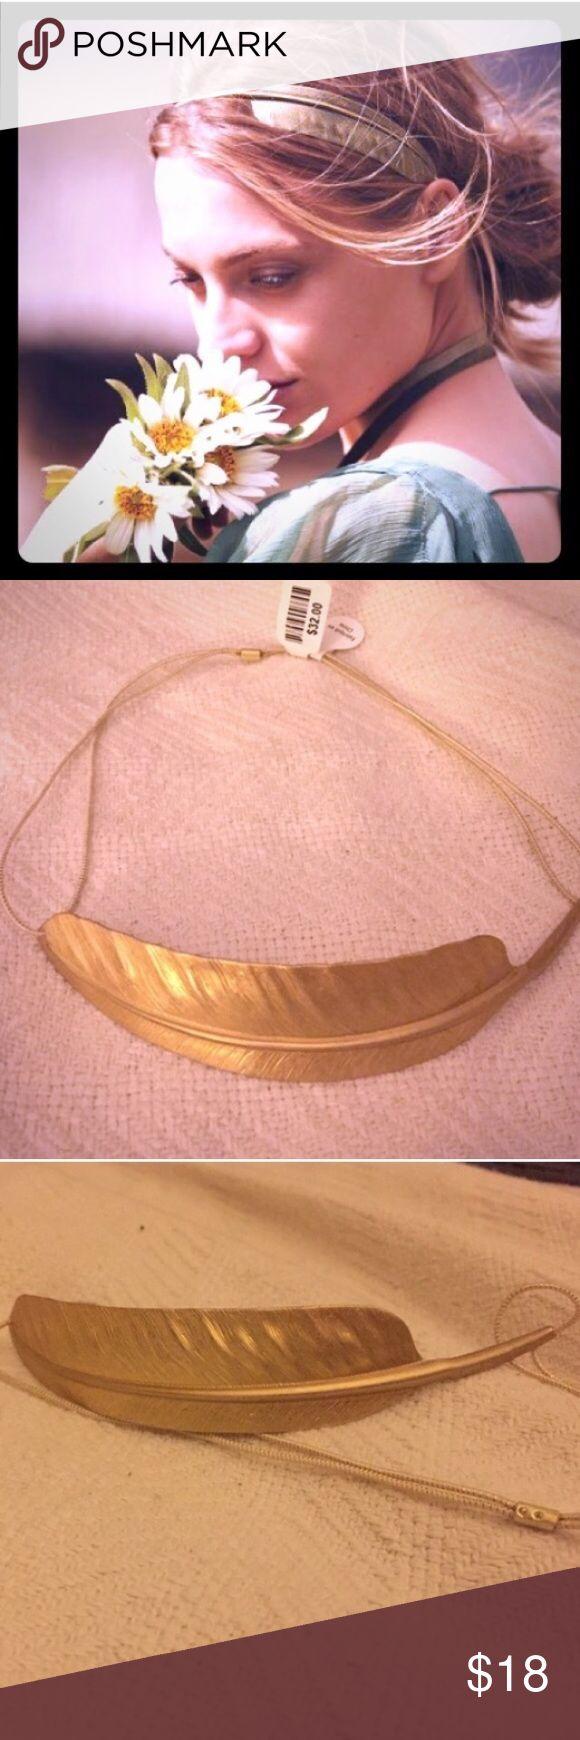 "Anthropologie Arc feather metallic headband (gold) Metallic feather; doubled, thin elastic band. Feather is 1"" wide. Anthropologie Accessories Hair Accessories"